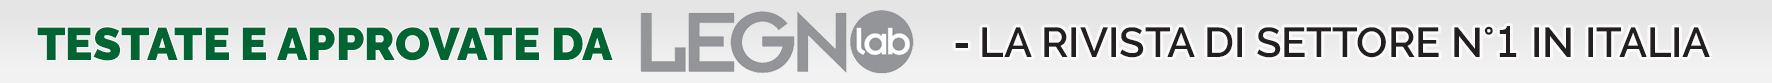 Testate e Approvate da Legnolab